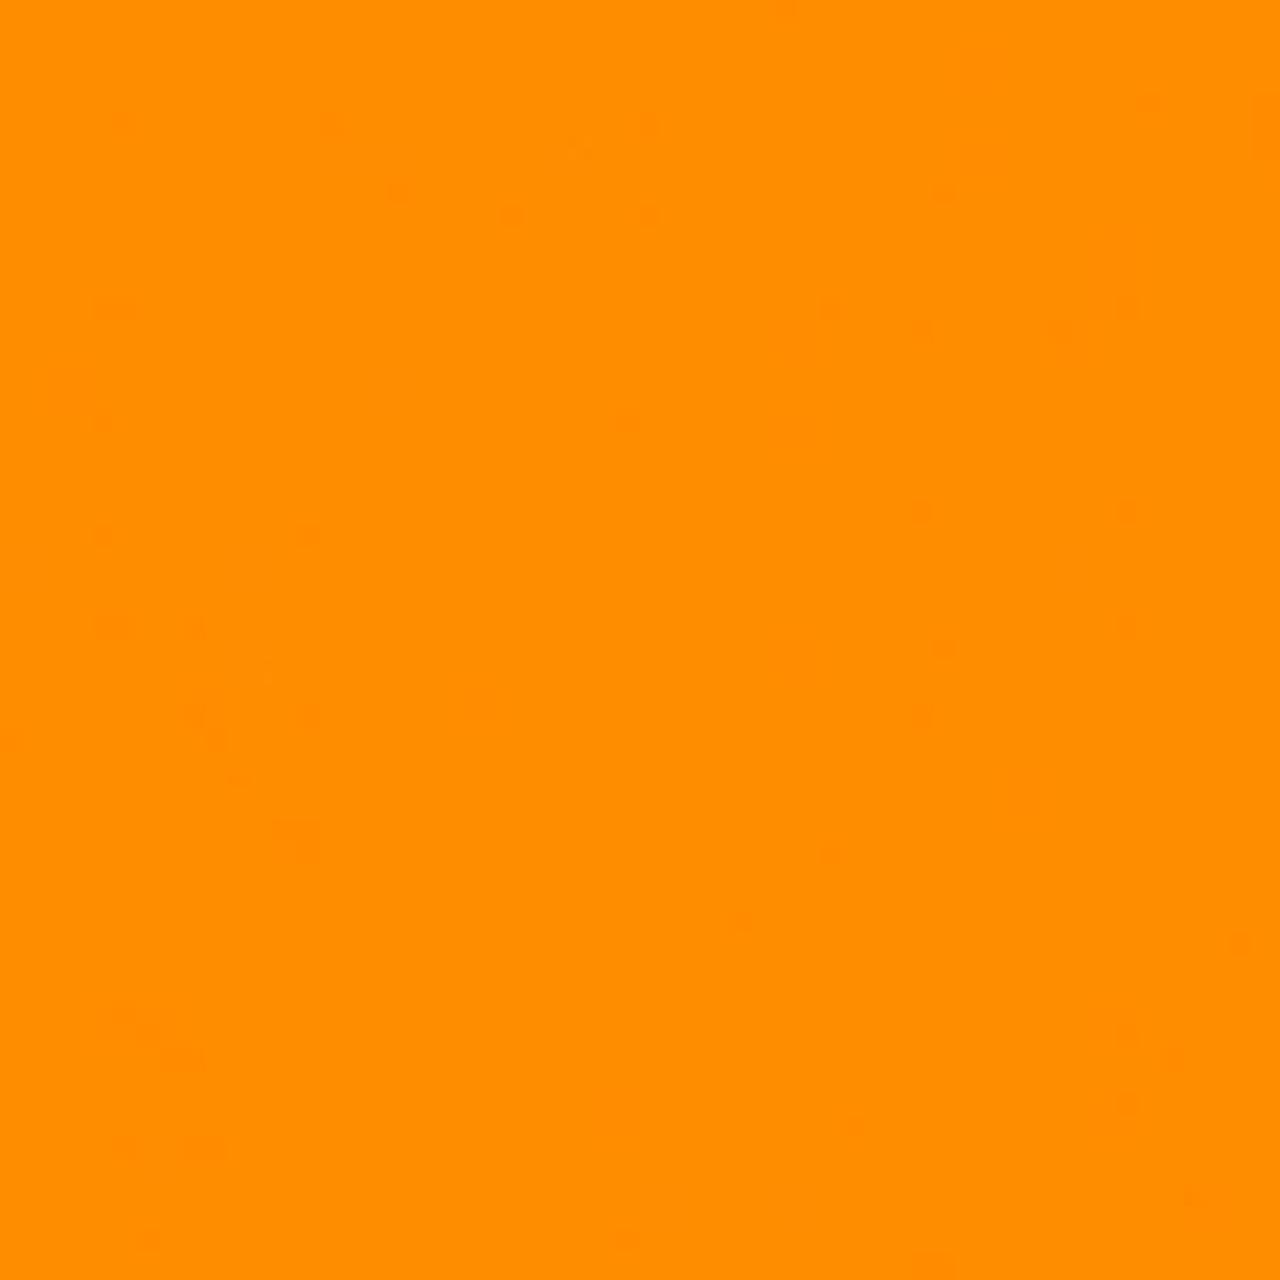 "#0020 Rosco Gels Roscolux Medium Amber, 20x24"""